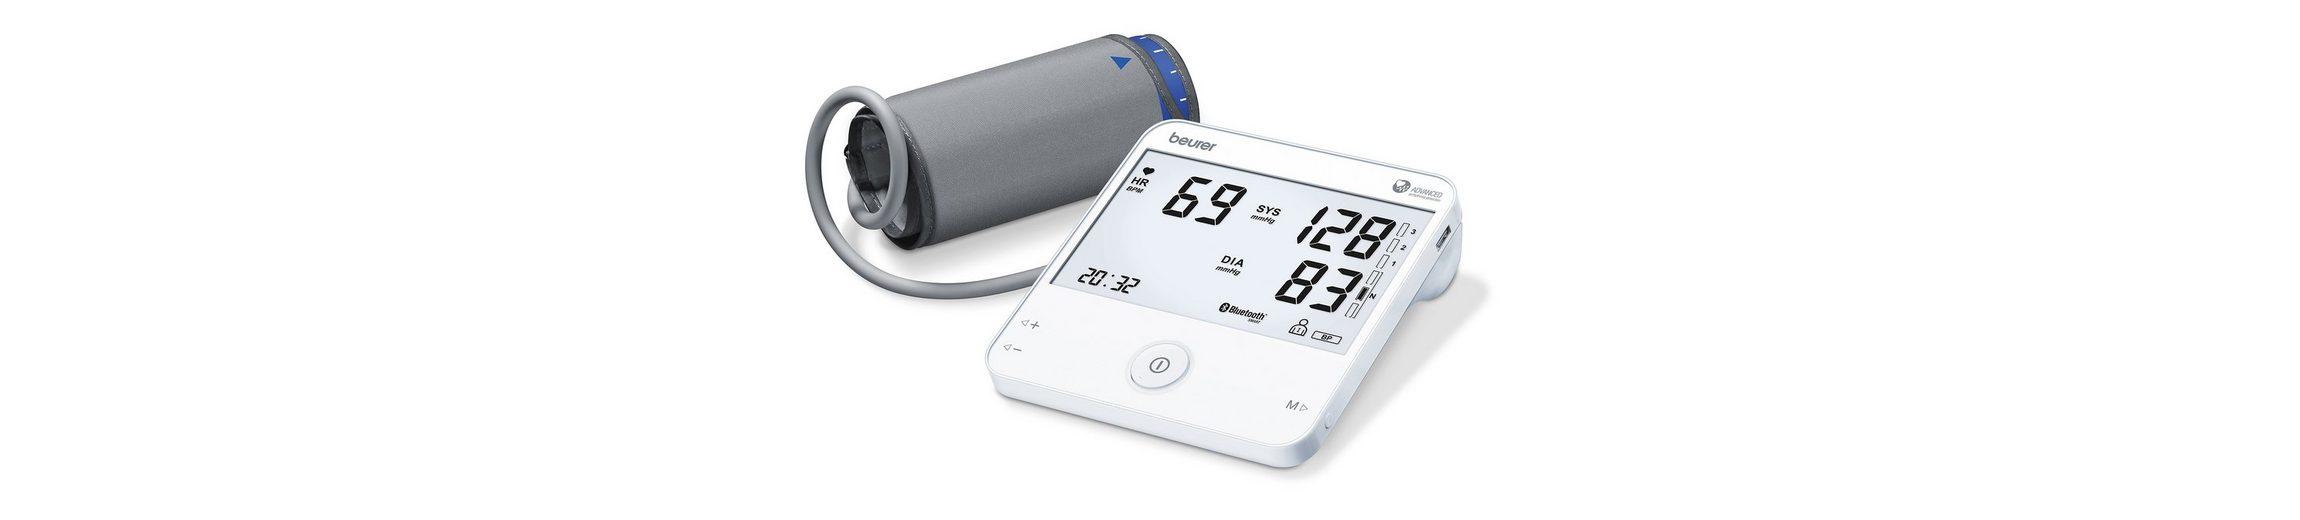 Beurer Blutdruckmessgerät BM 95 mit EKG Funktion